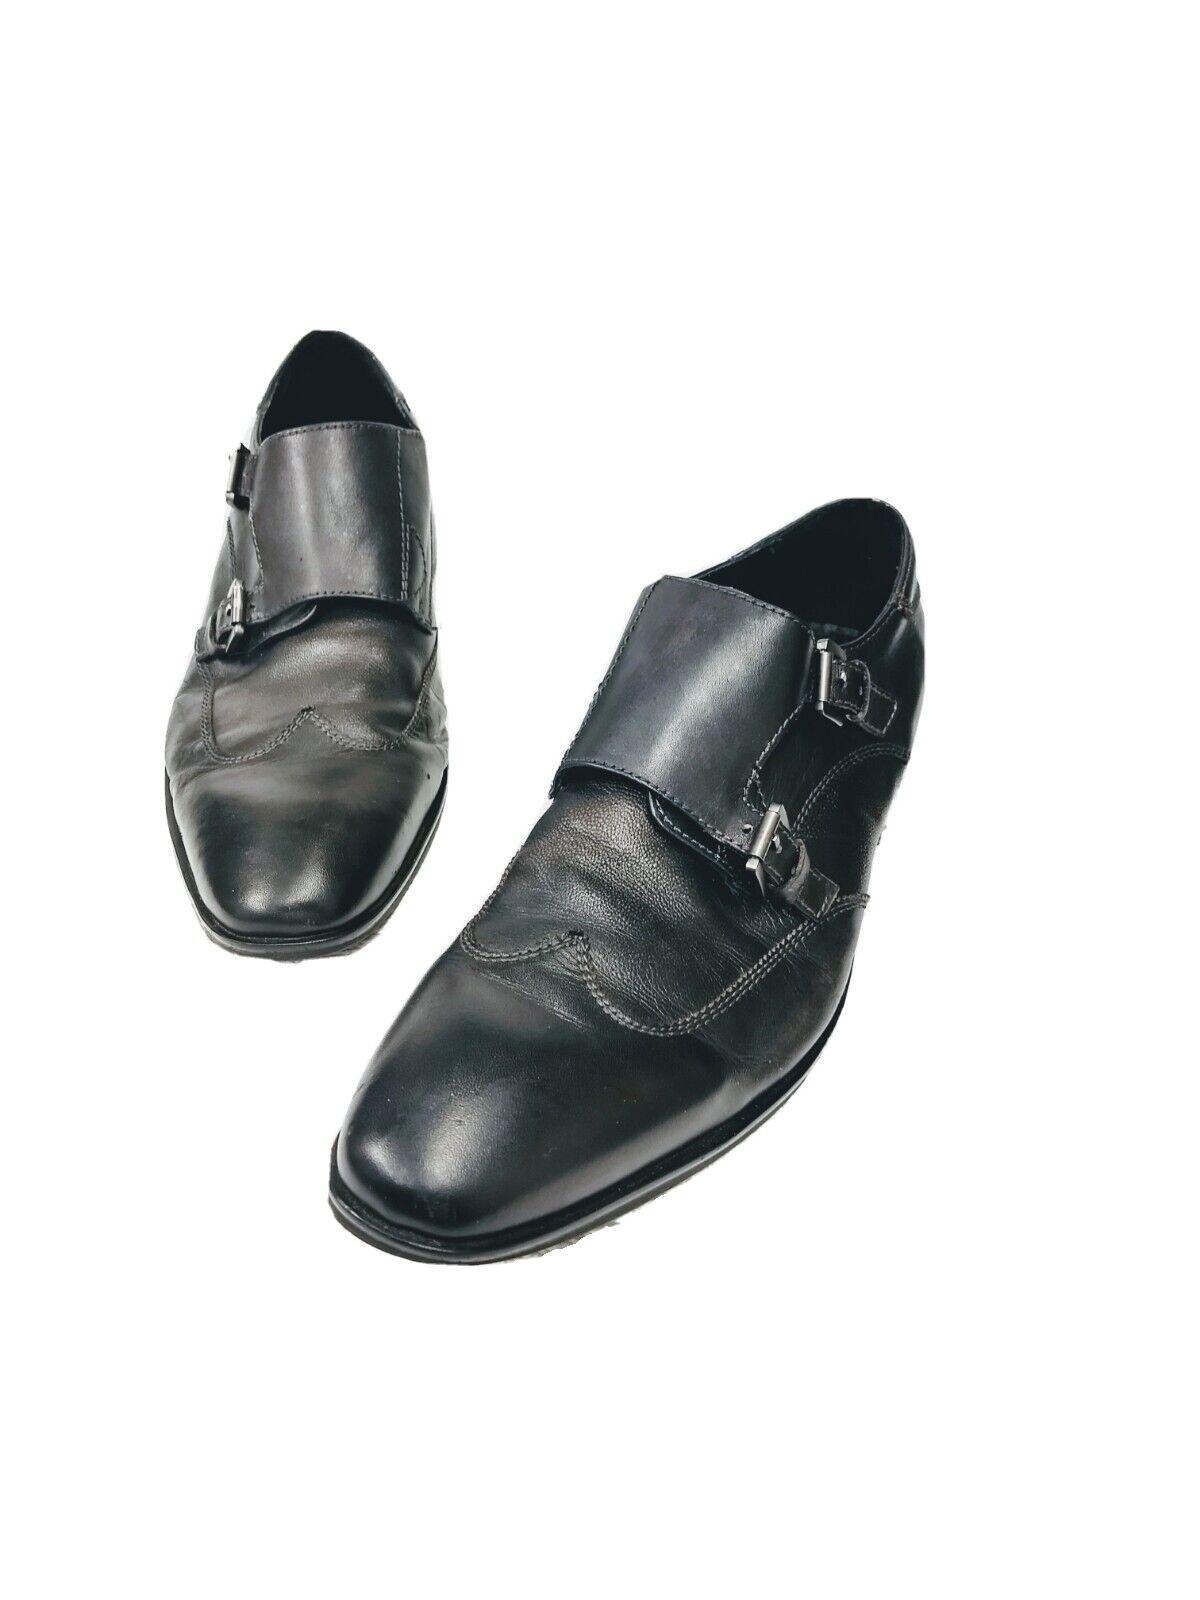 Kenneth Cole Men's 10.5 Double Monk Strap Dress Shoes Burning Oil Black Leather